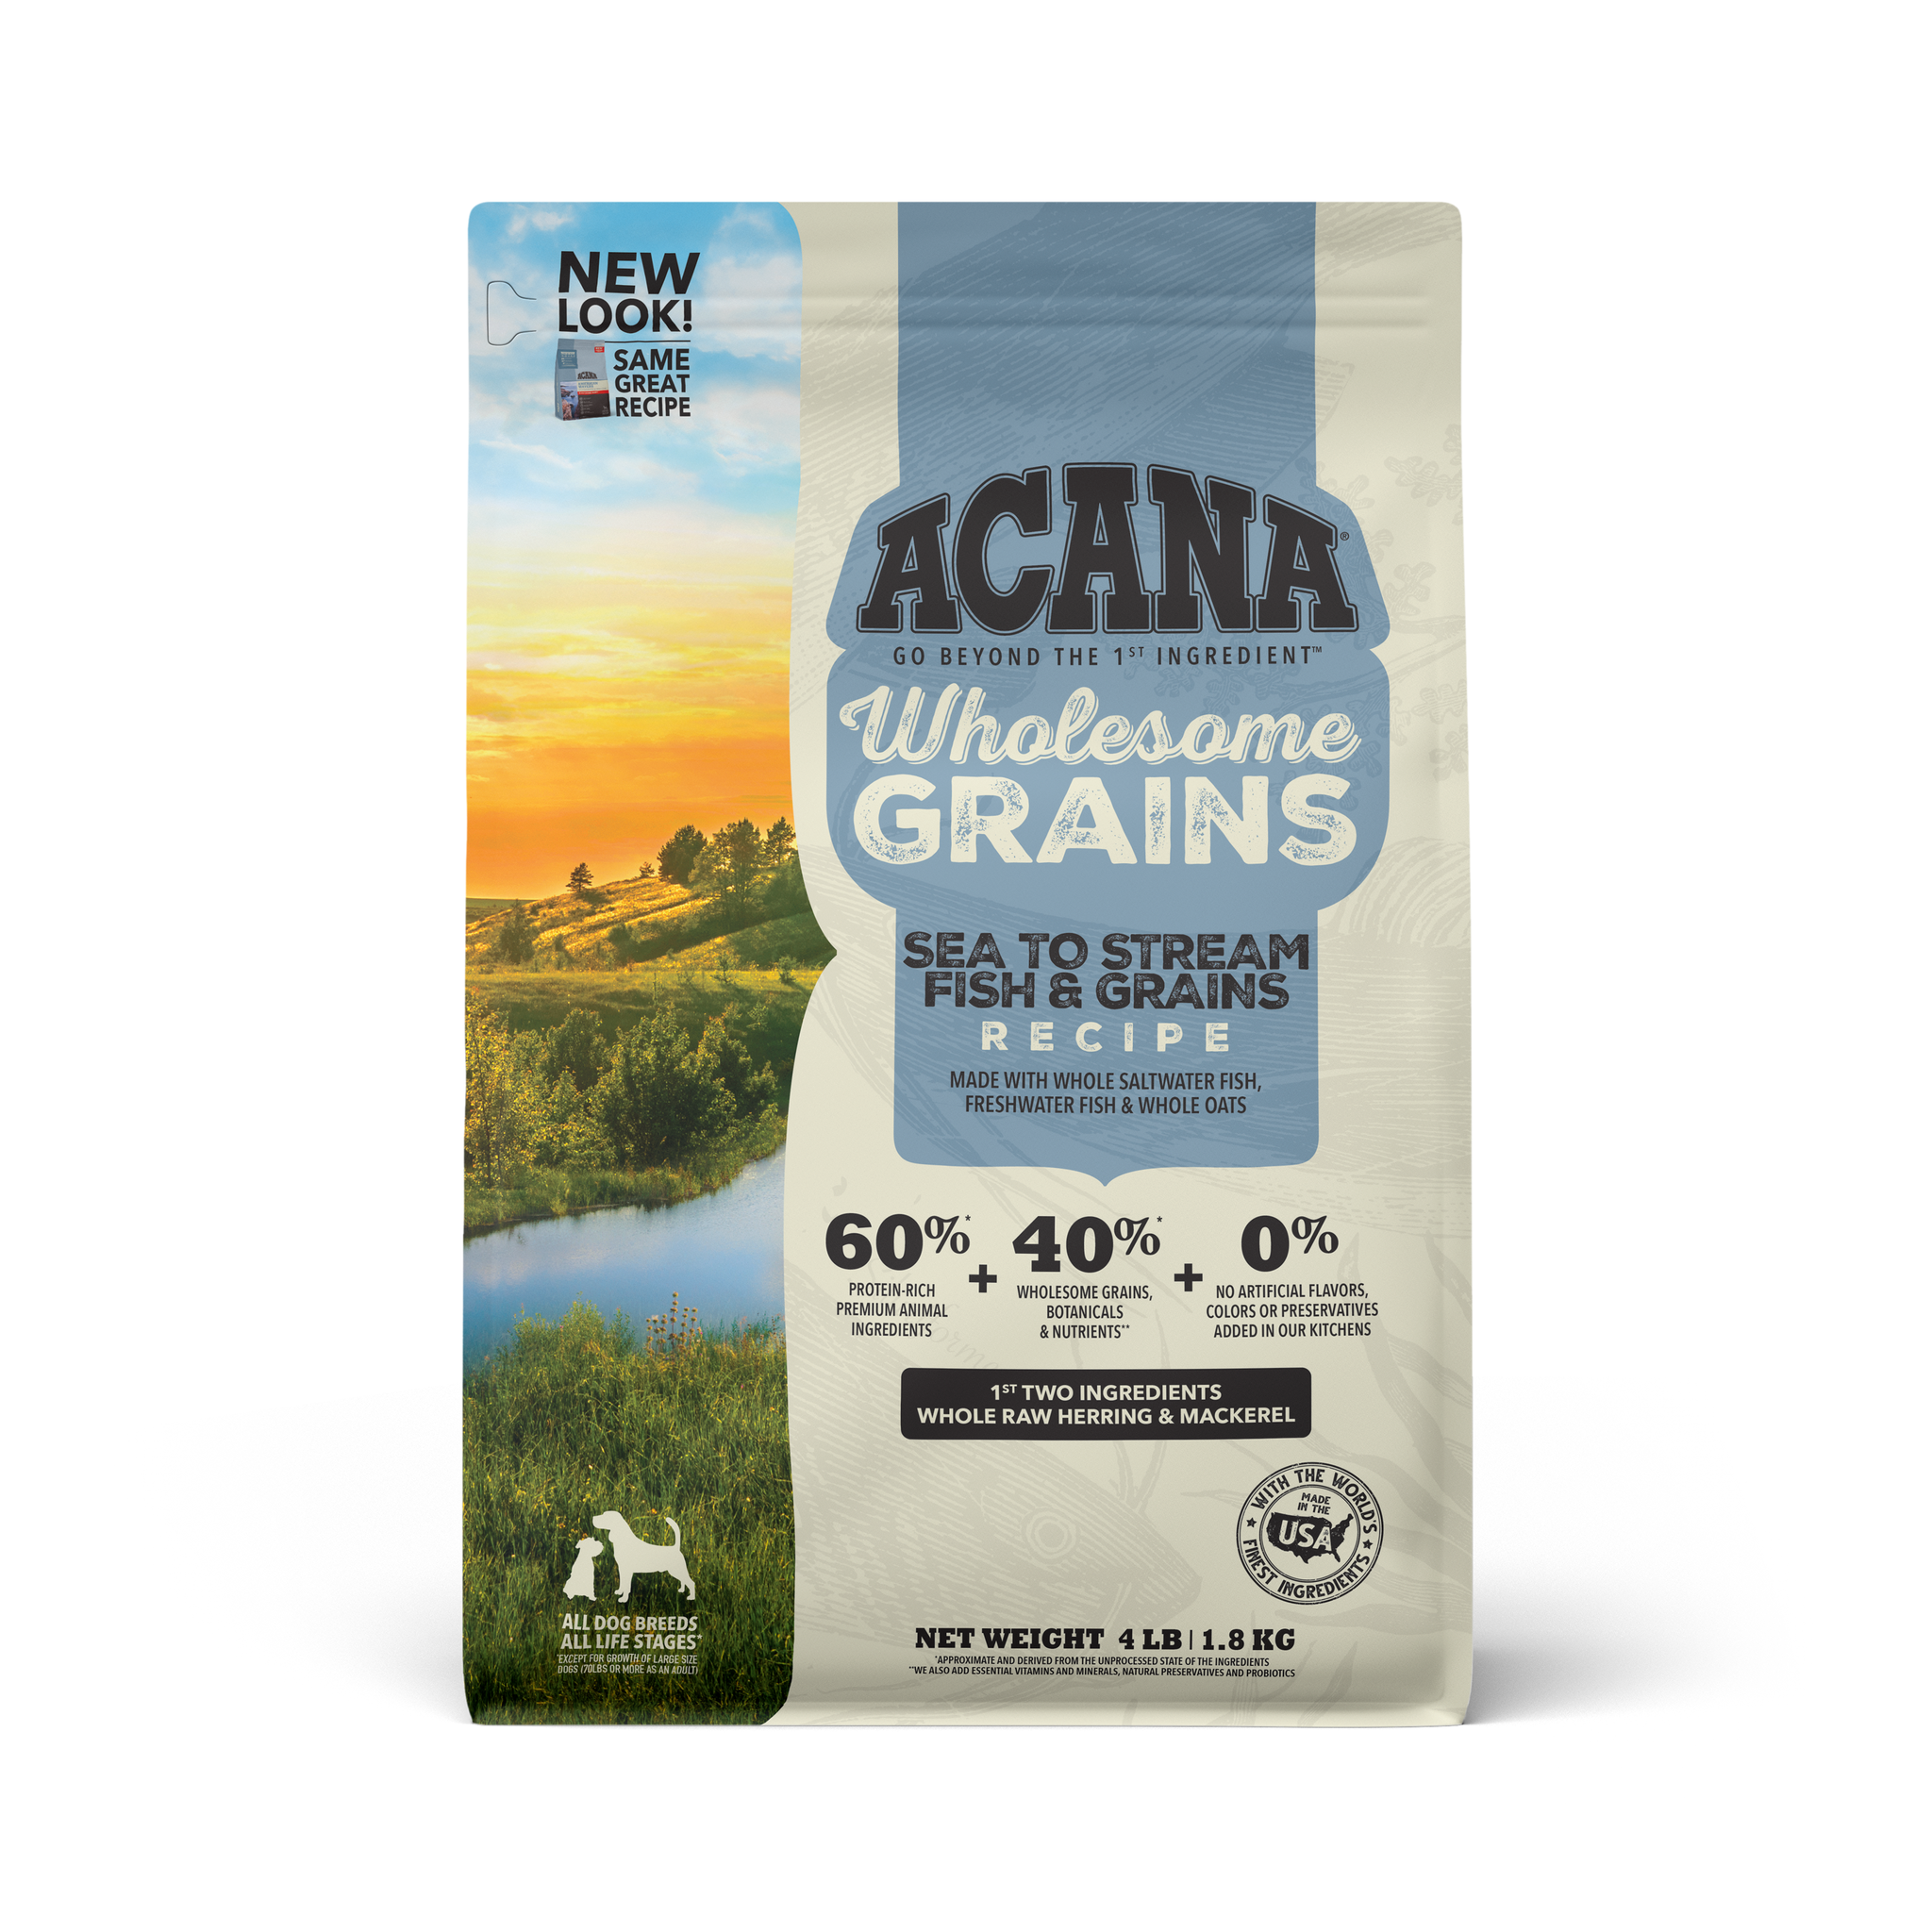 Acana Acana Regionals Wholesome Grains Sea to Stream Dry Dog Food